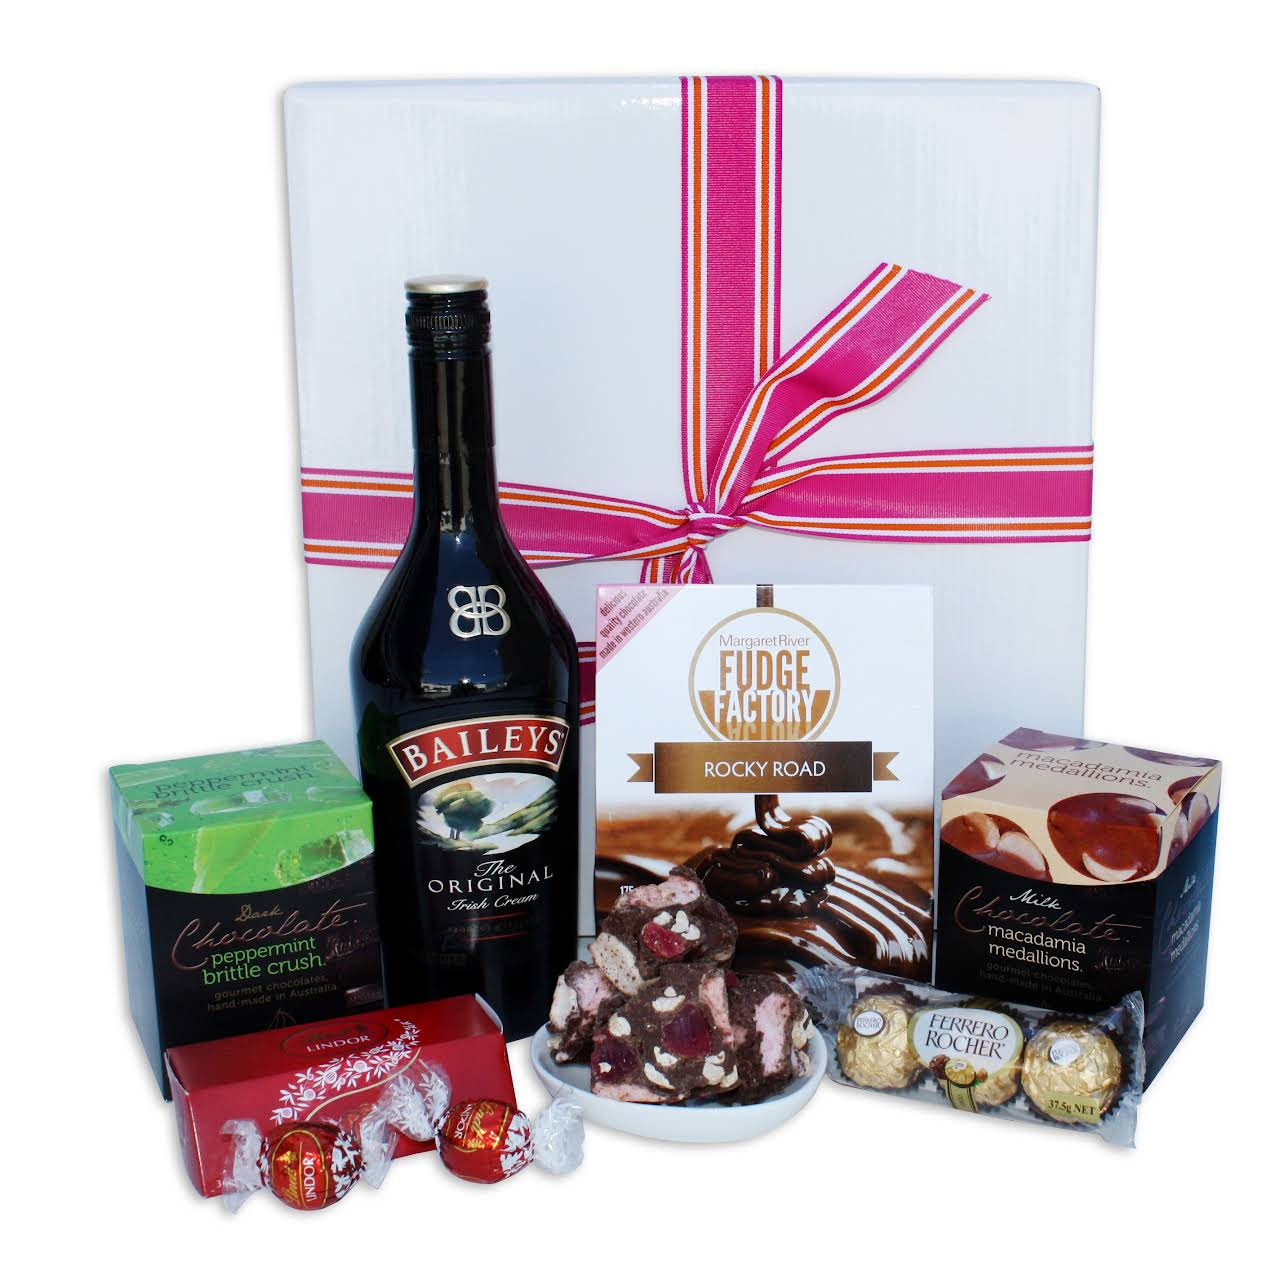 Gift Basket Store in Perth WA 6000